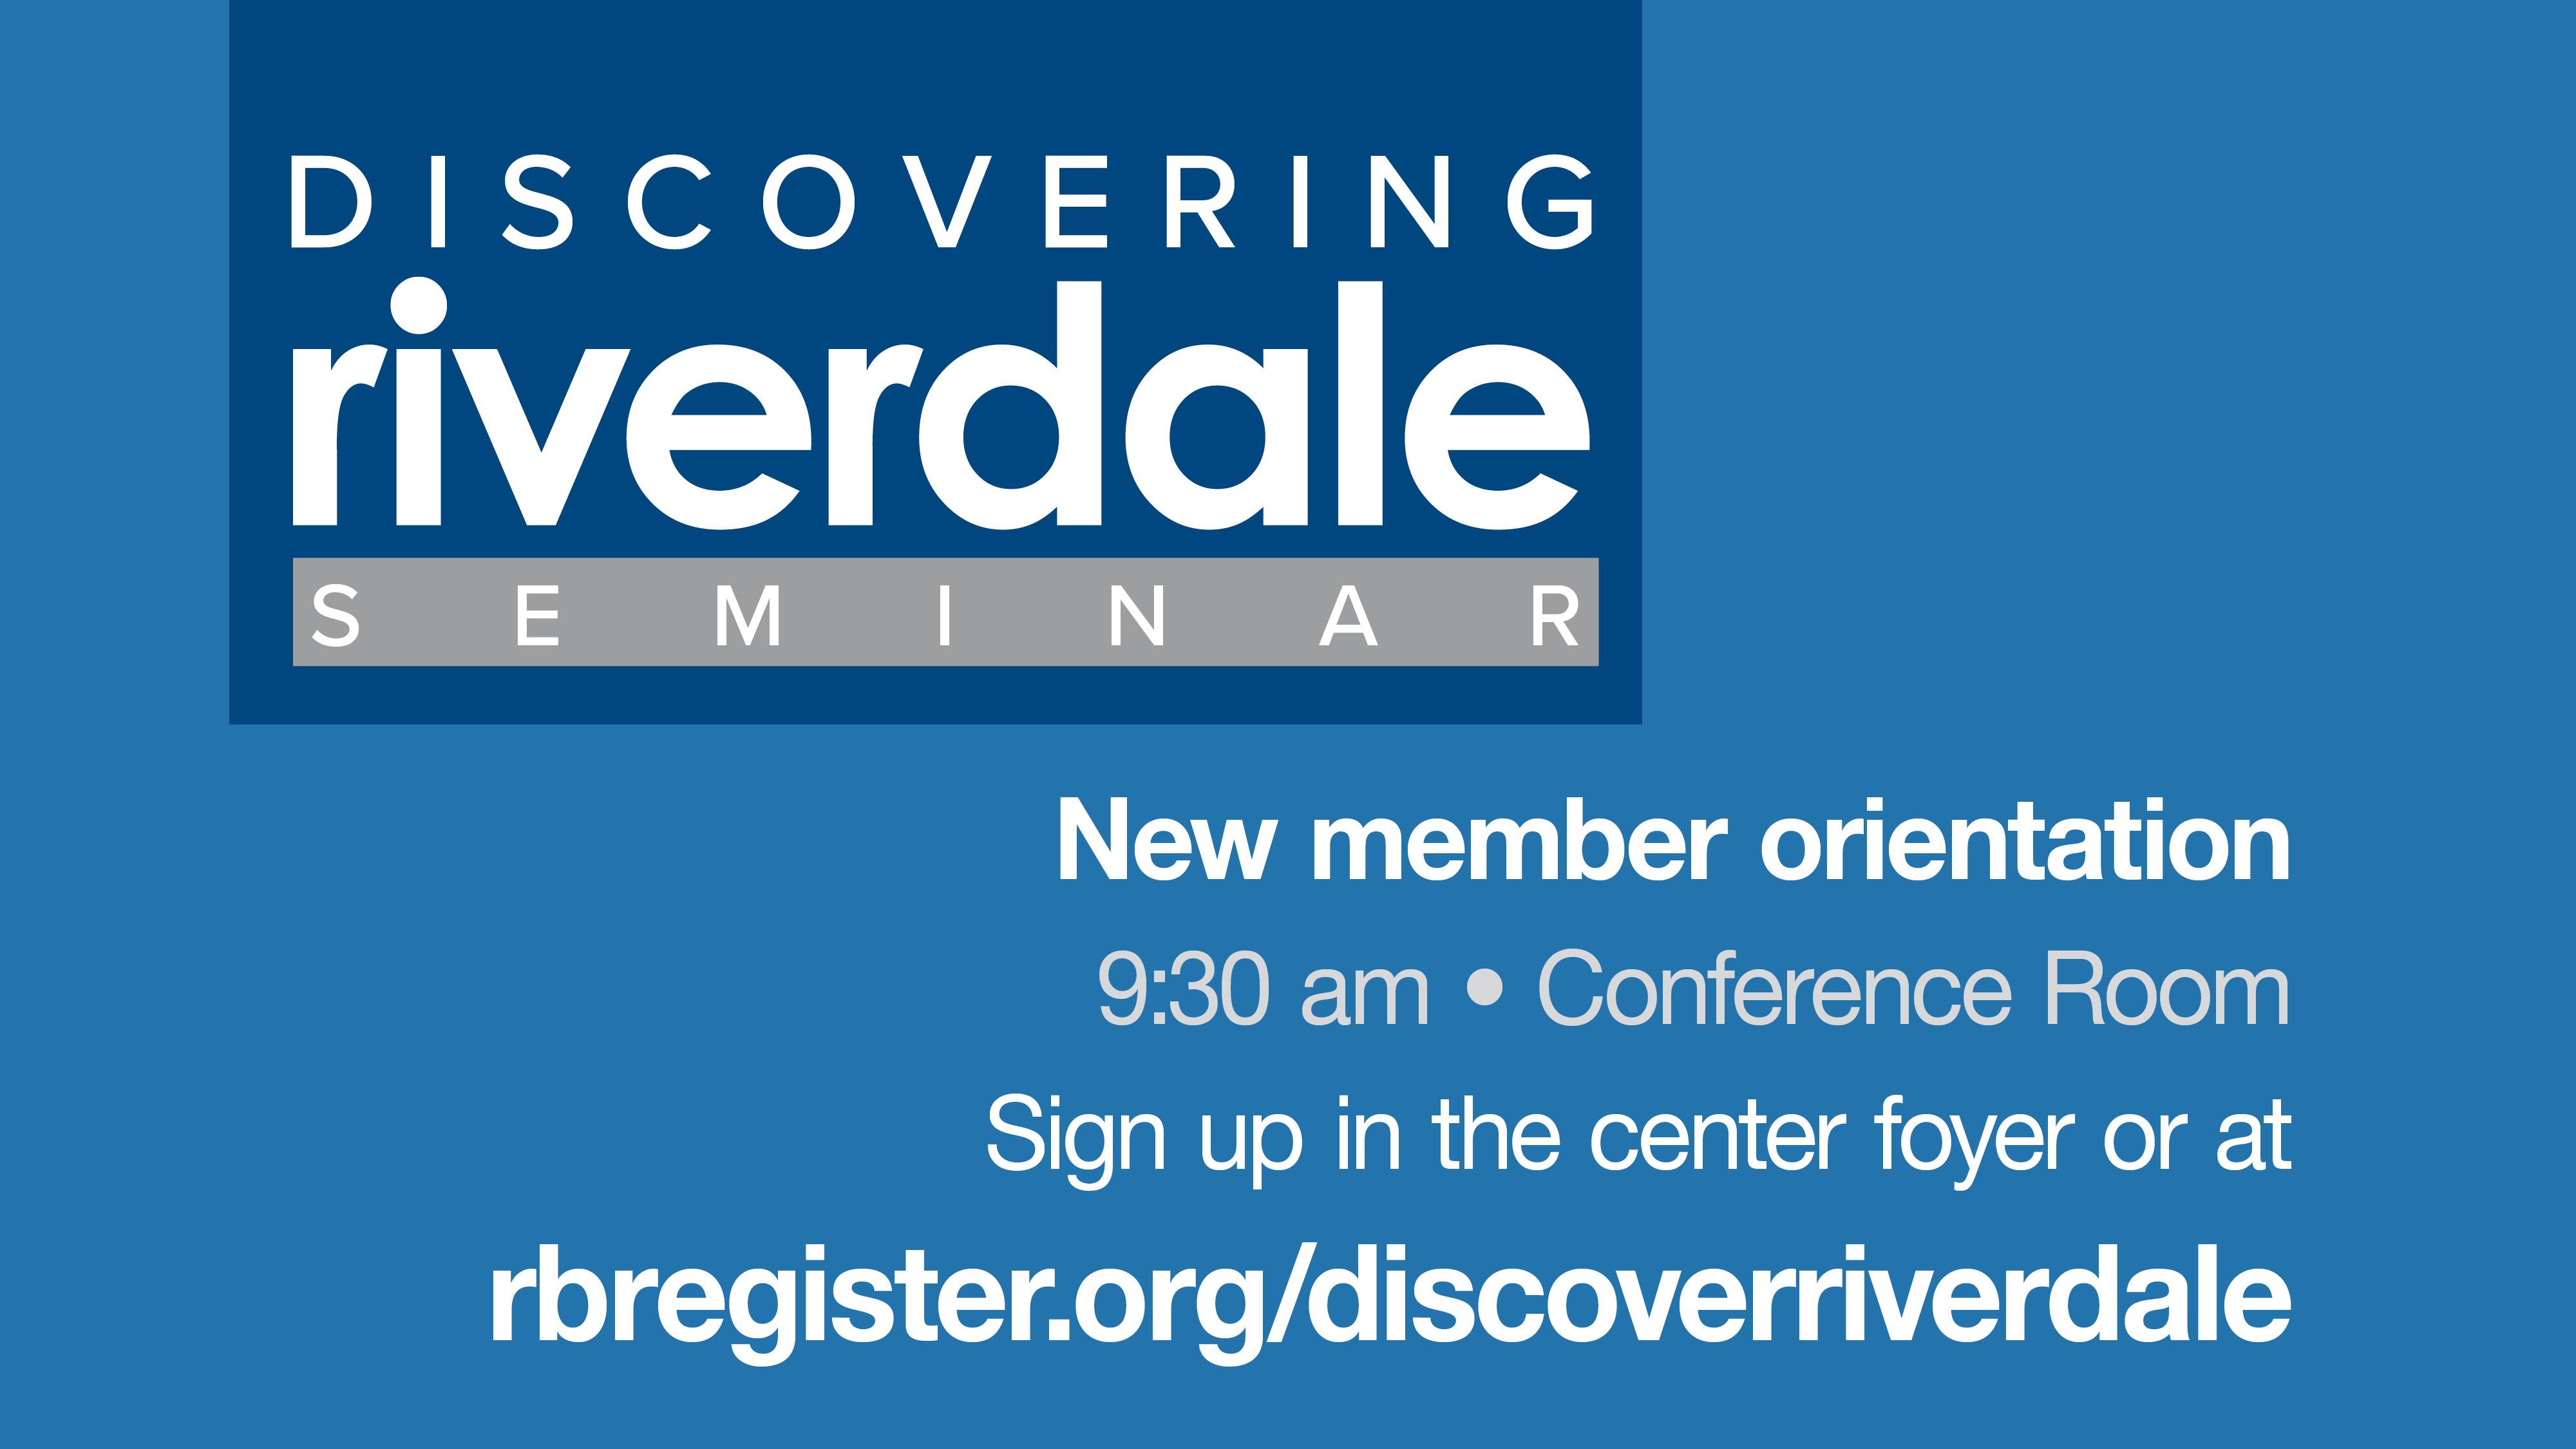 Discovering Riverdale Seminar